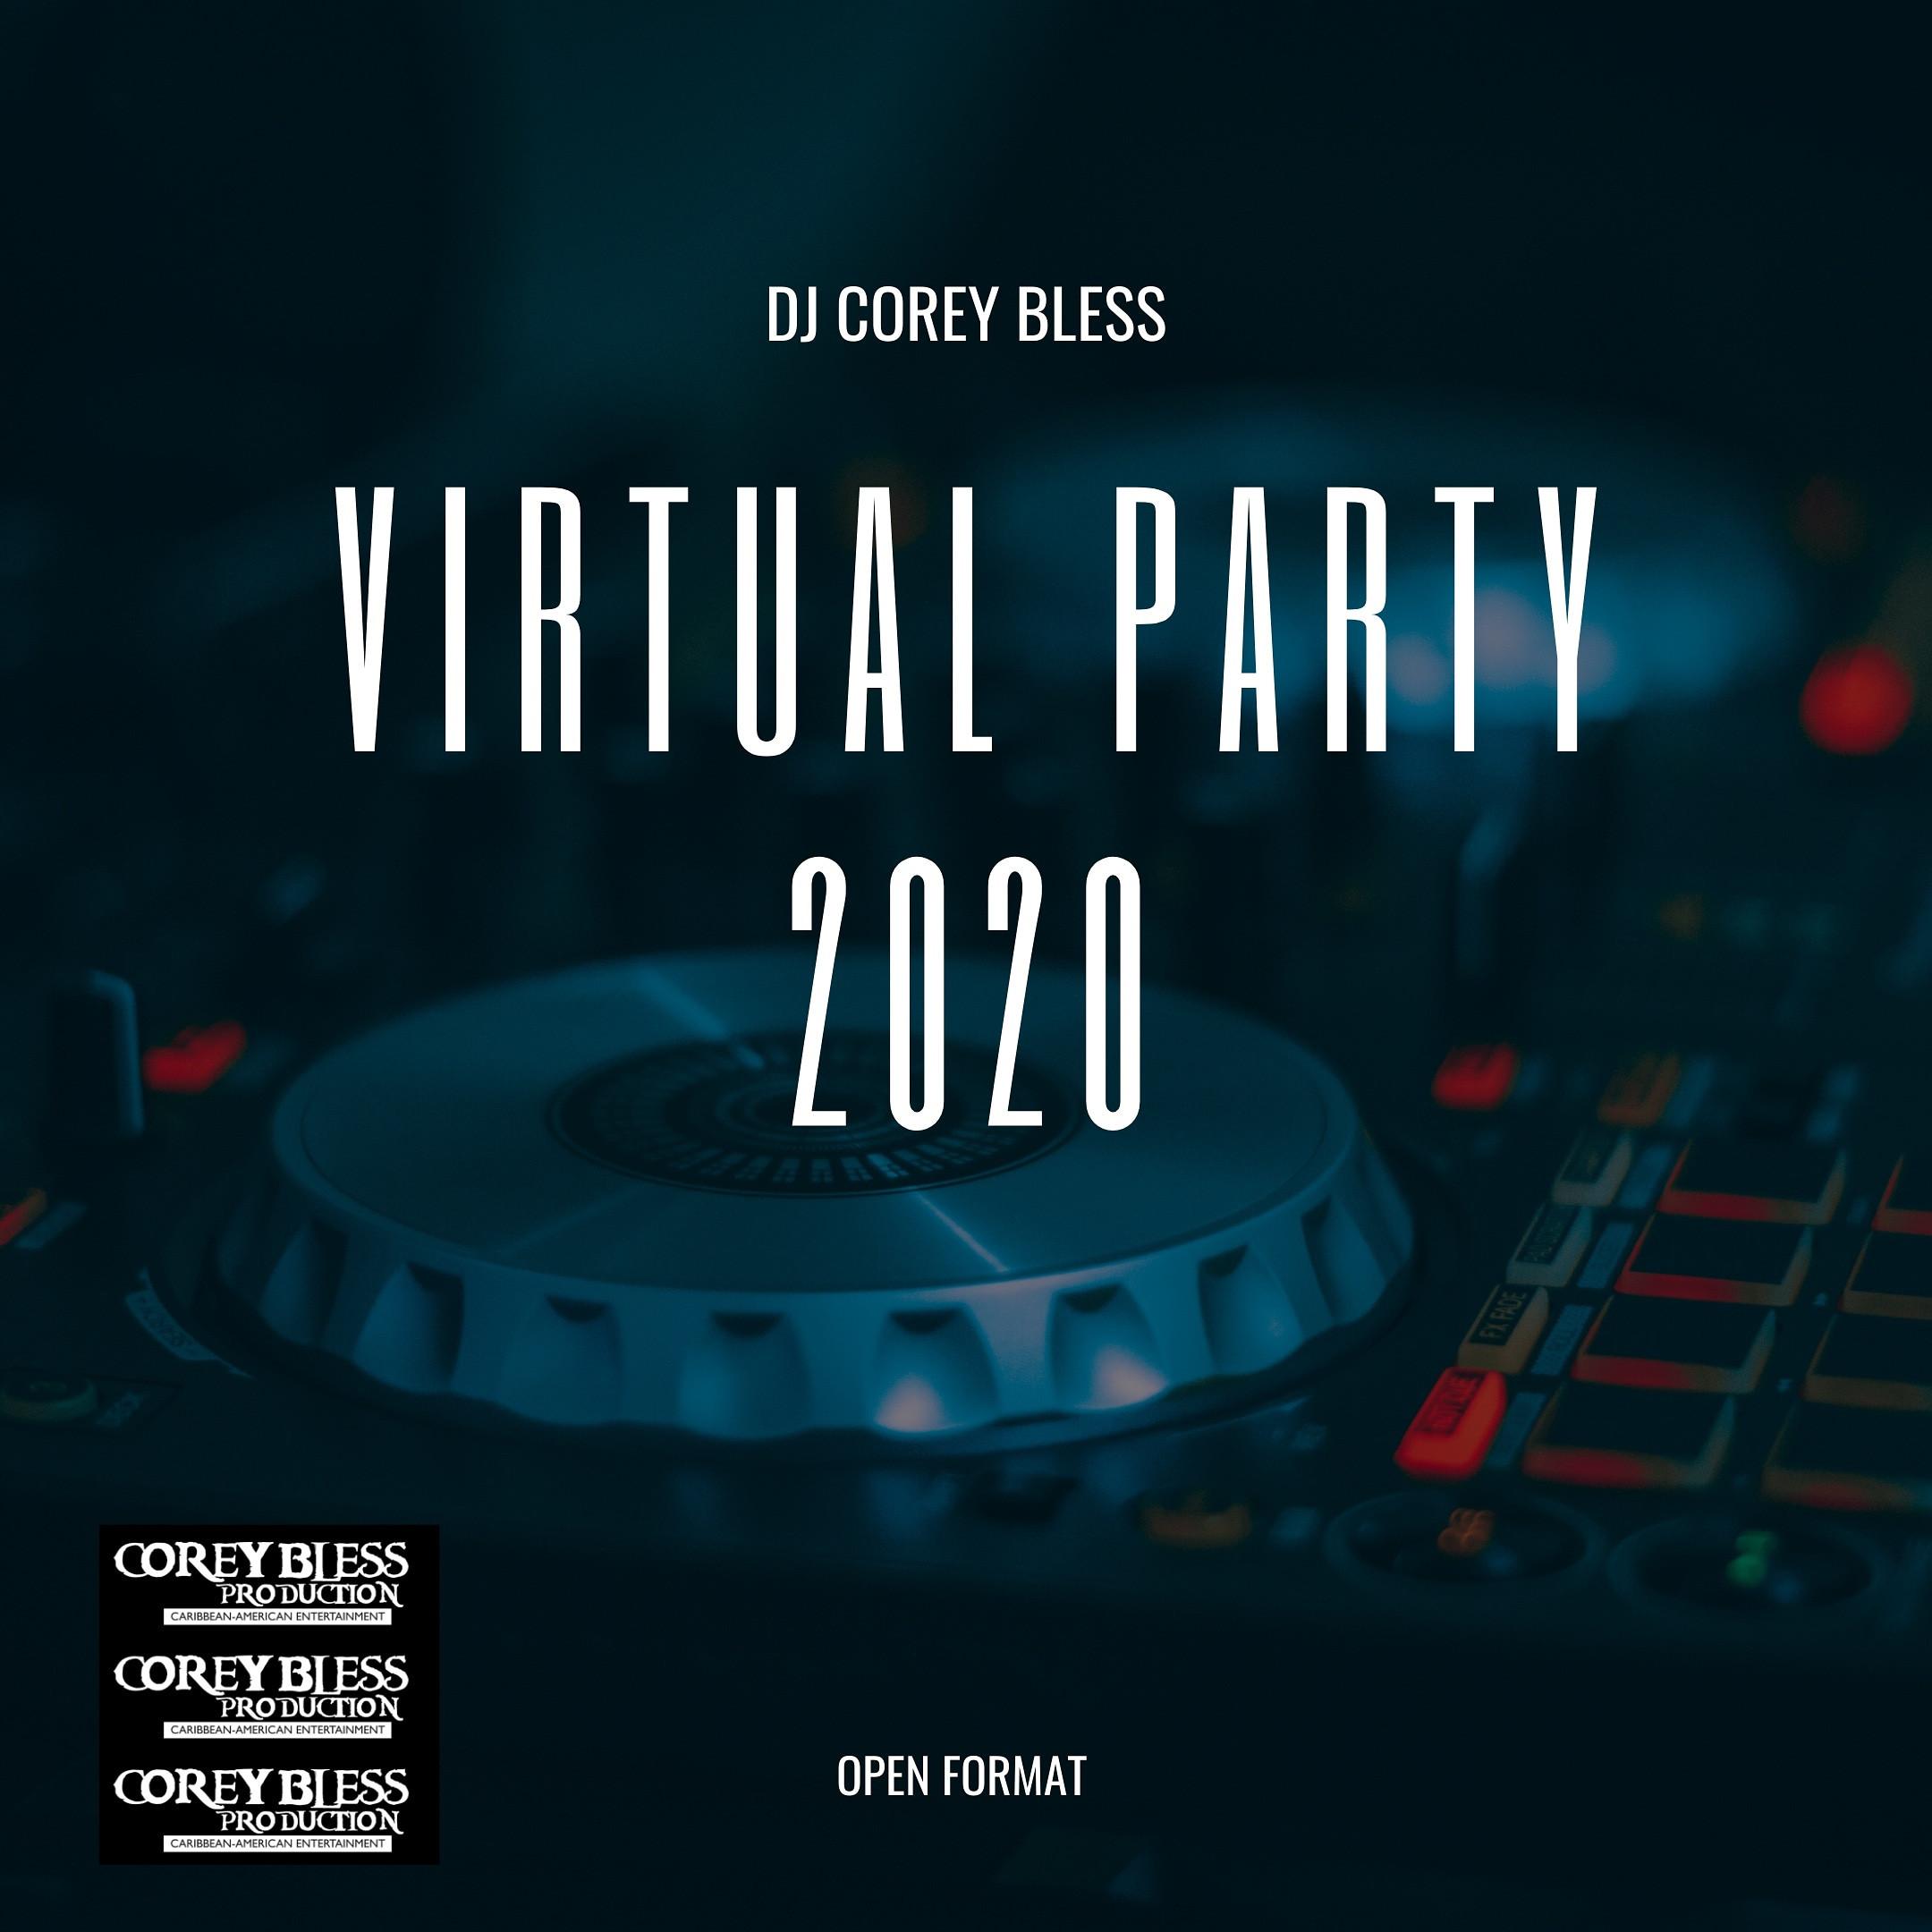 Virtual/Online event